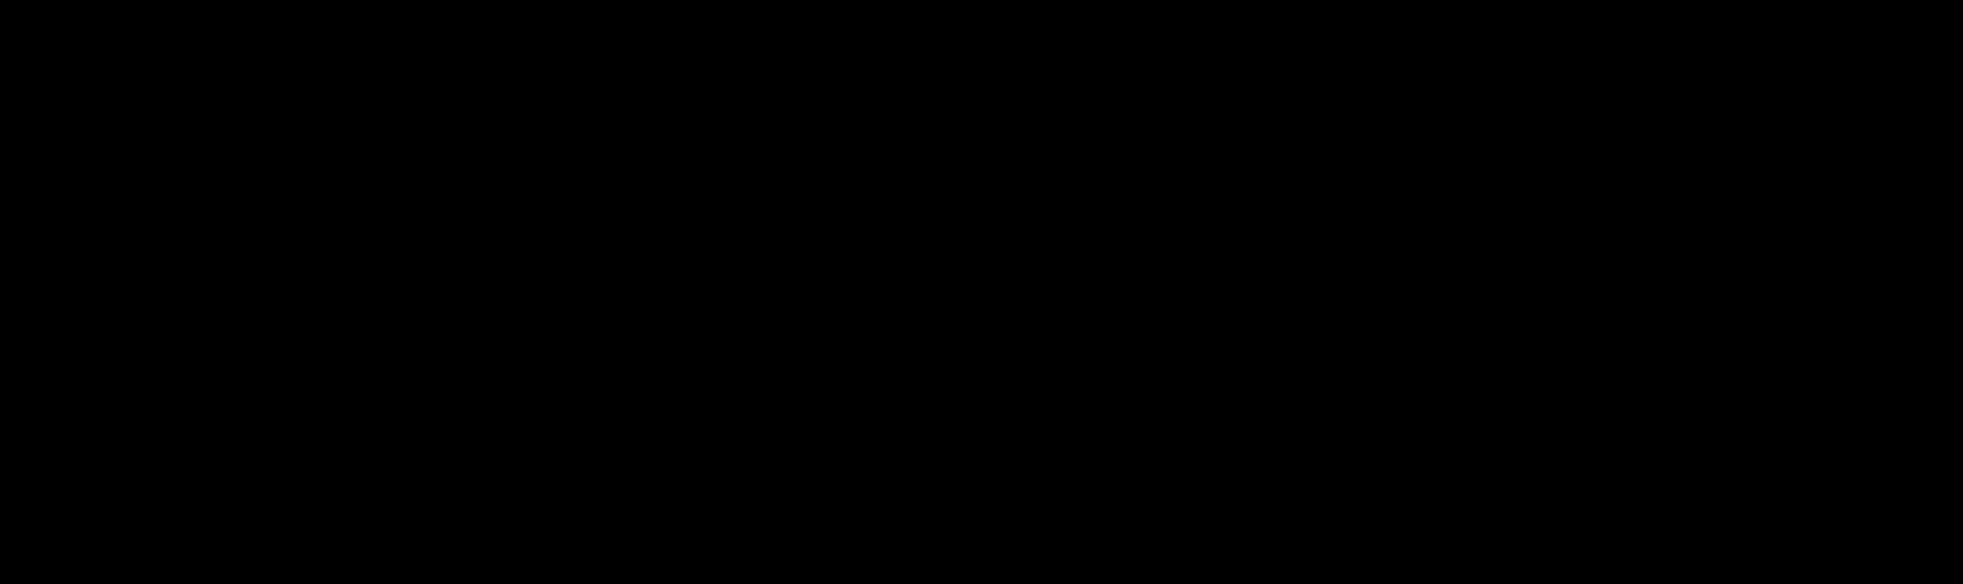 michiana-christian-camp-horizontal-black.png